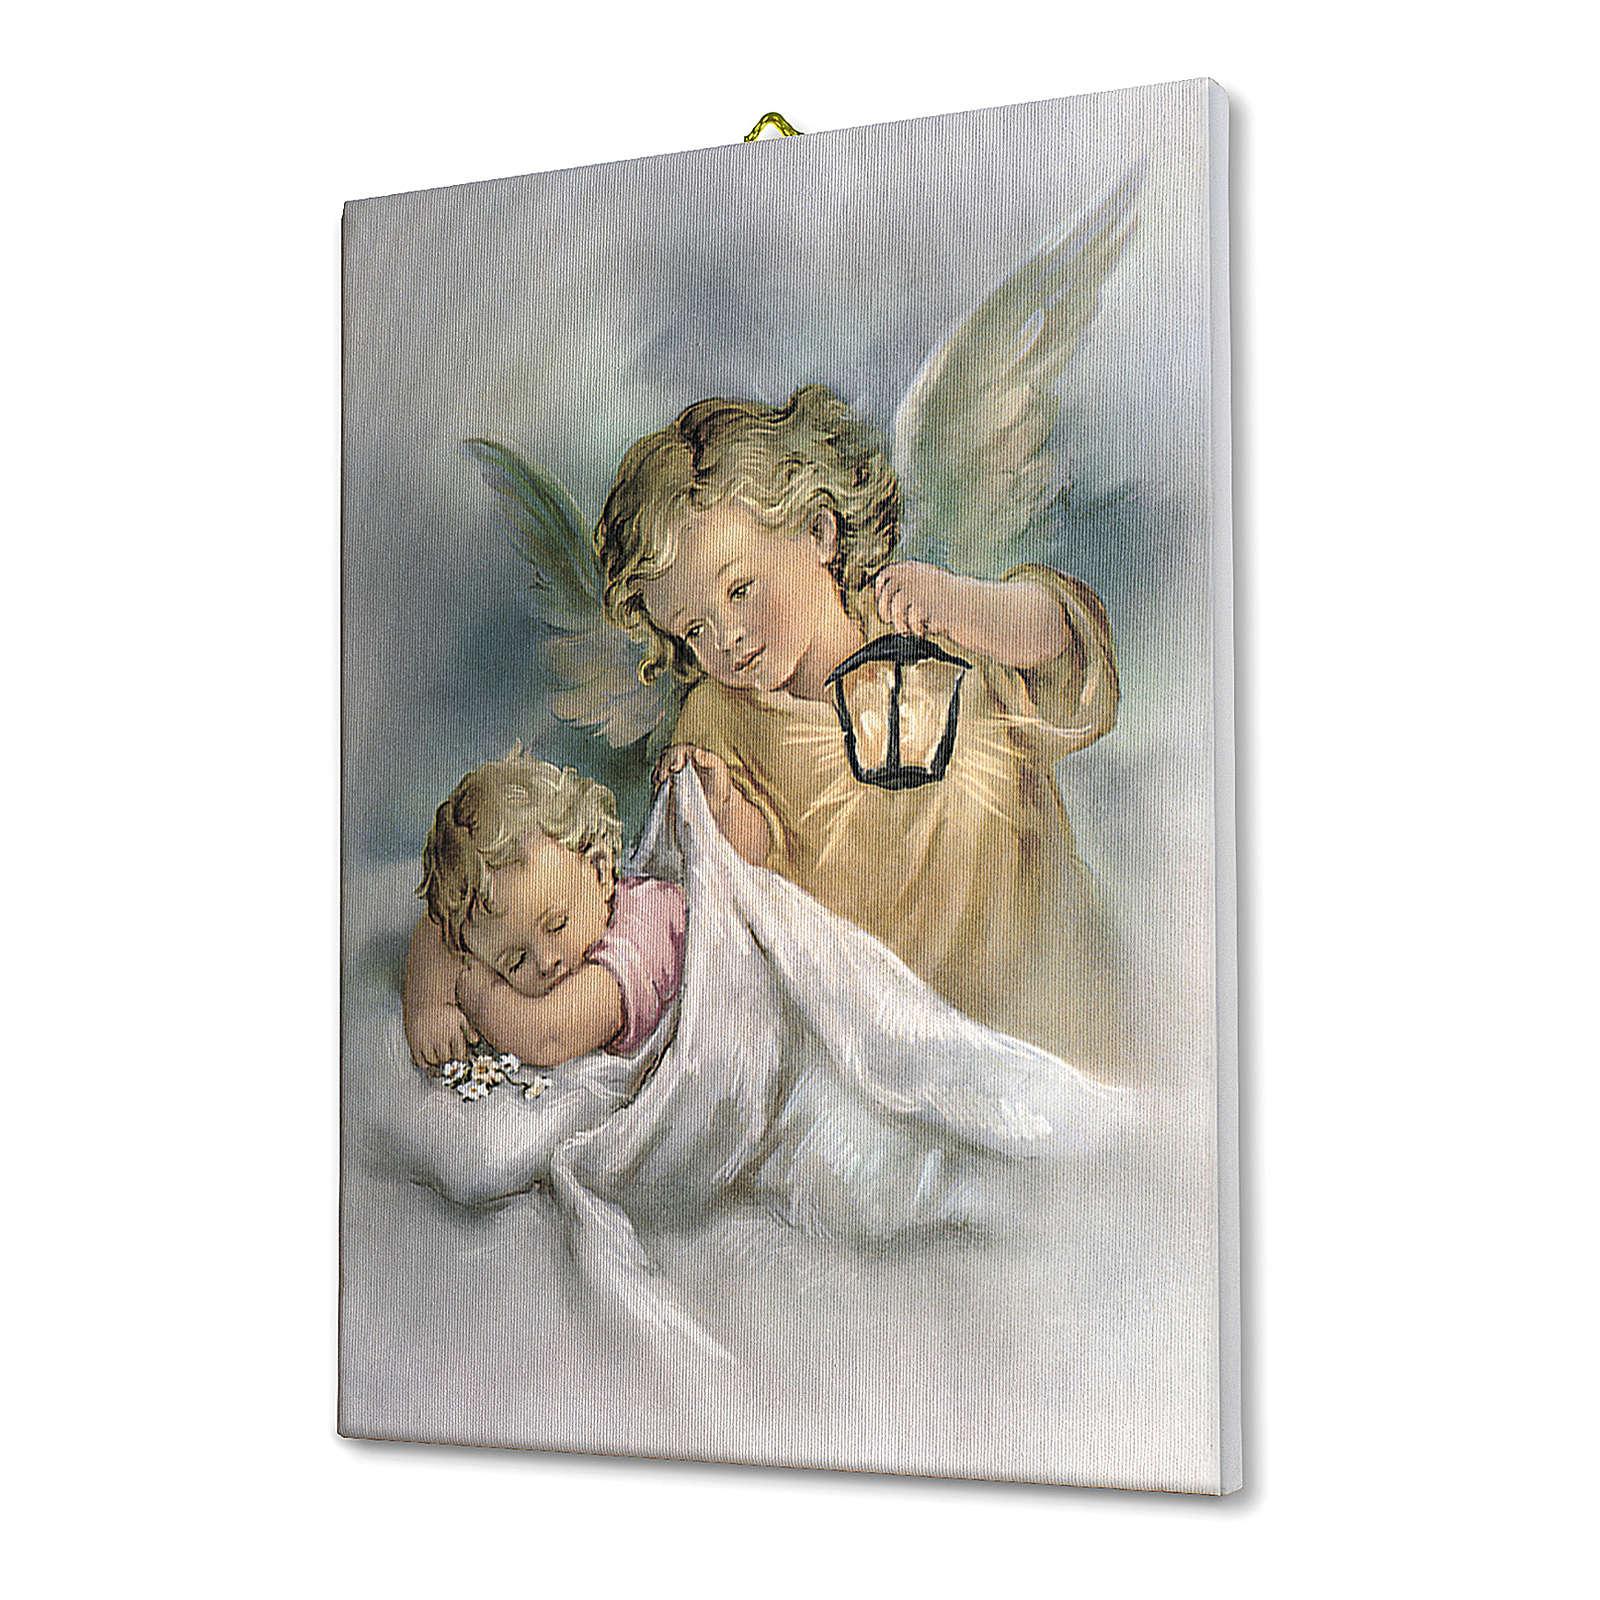 Quadro su tela pittorica Angelo Custode con Lanterna 25x20 cm 3